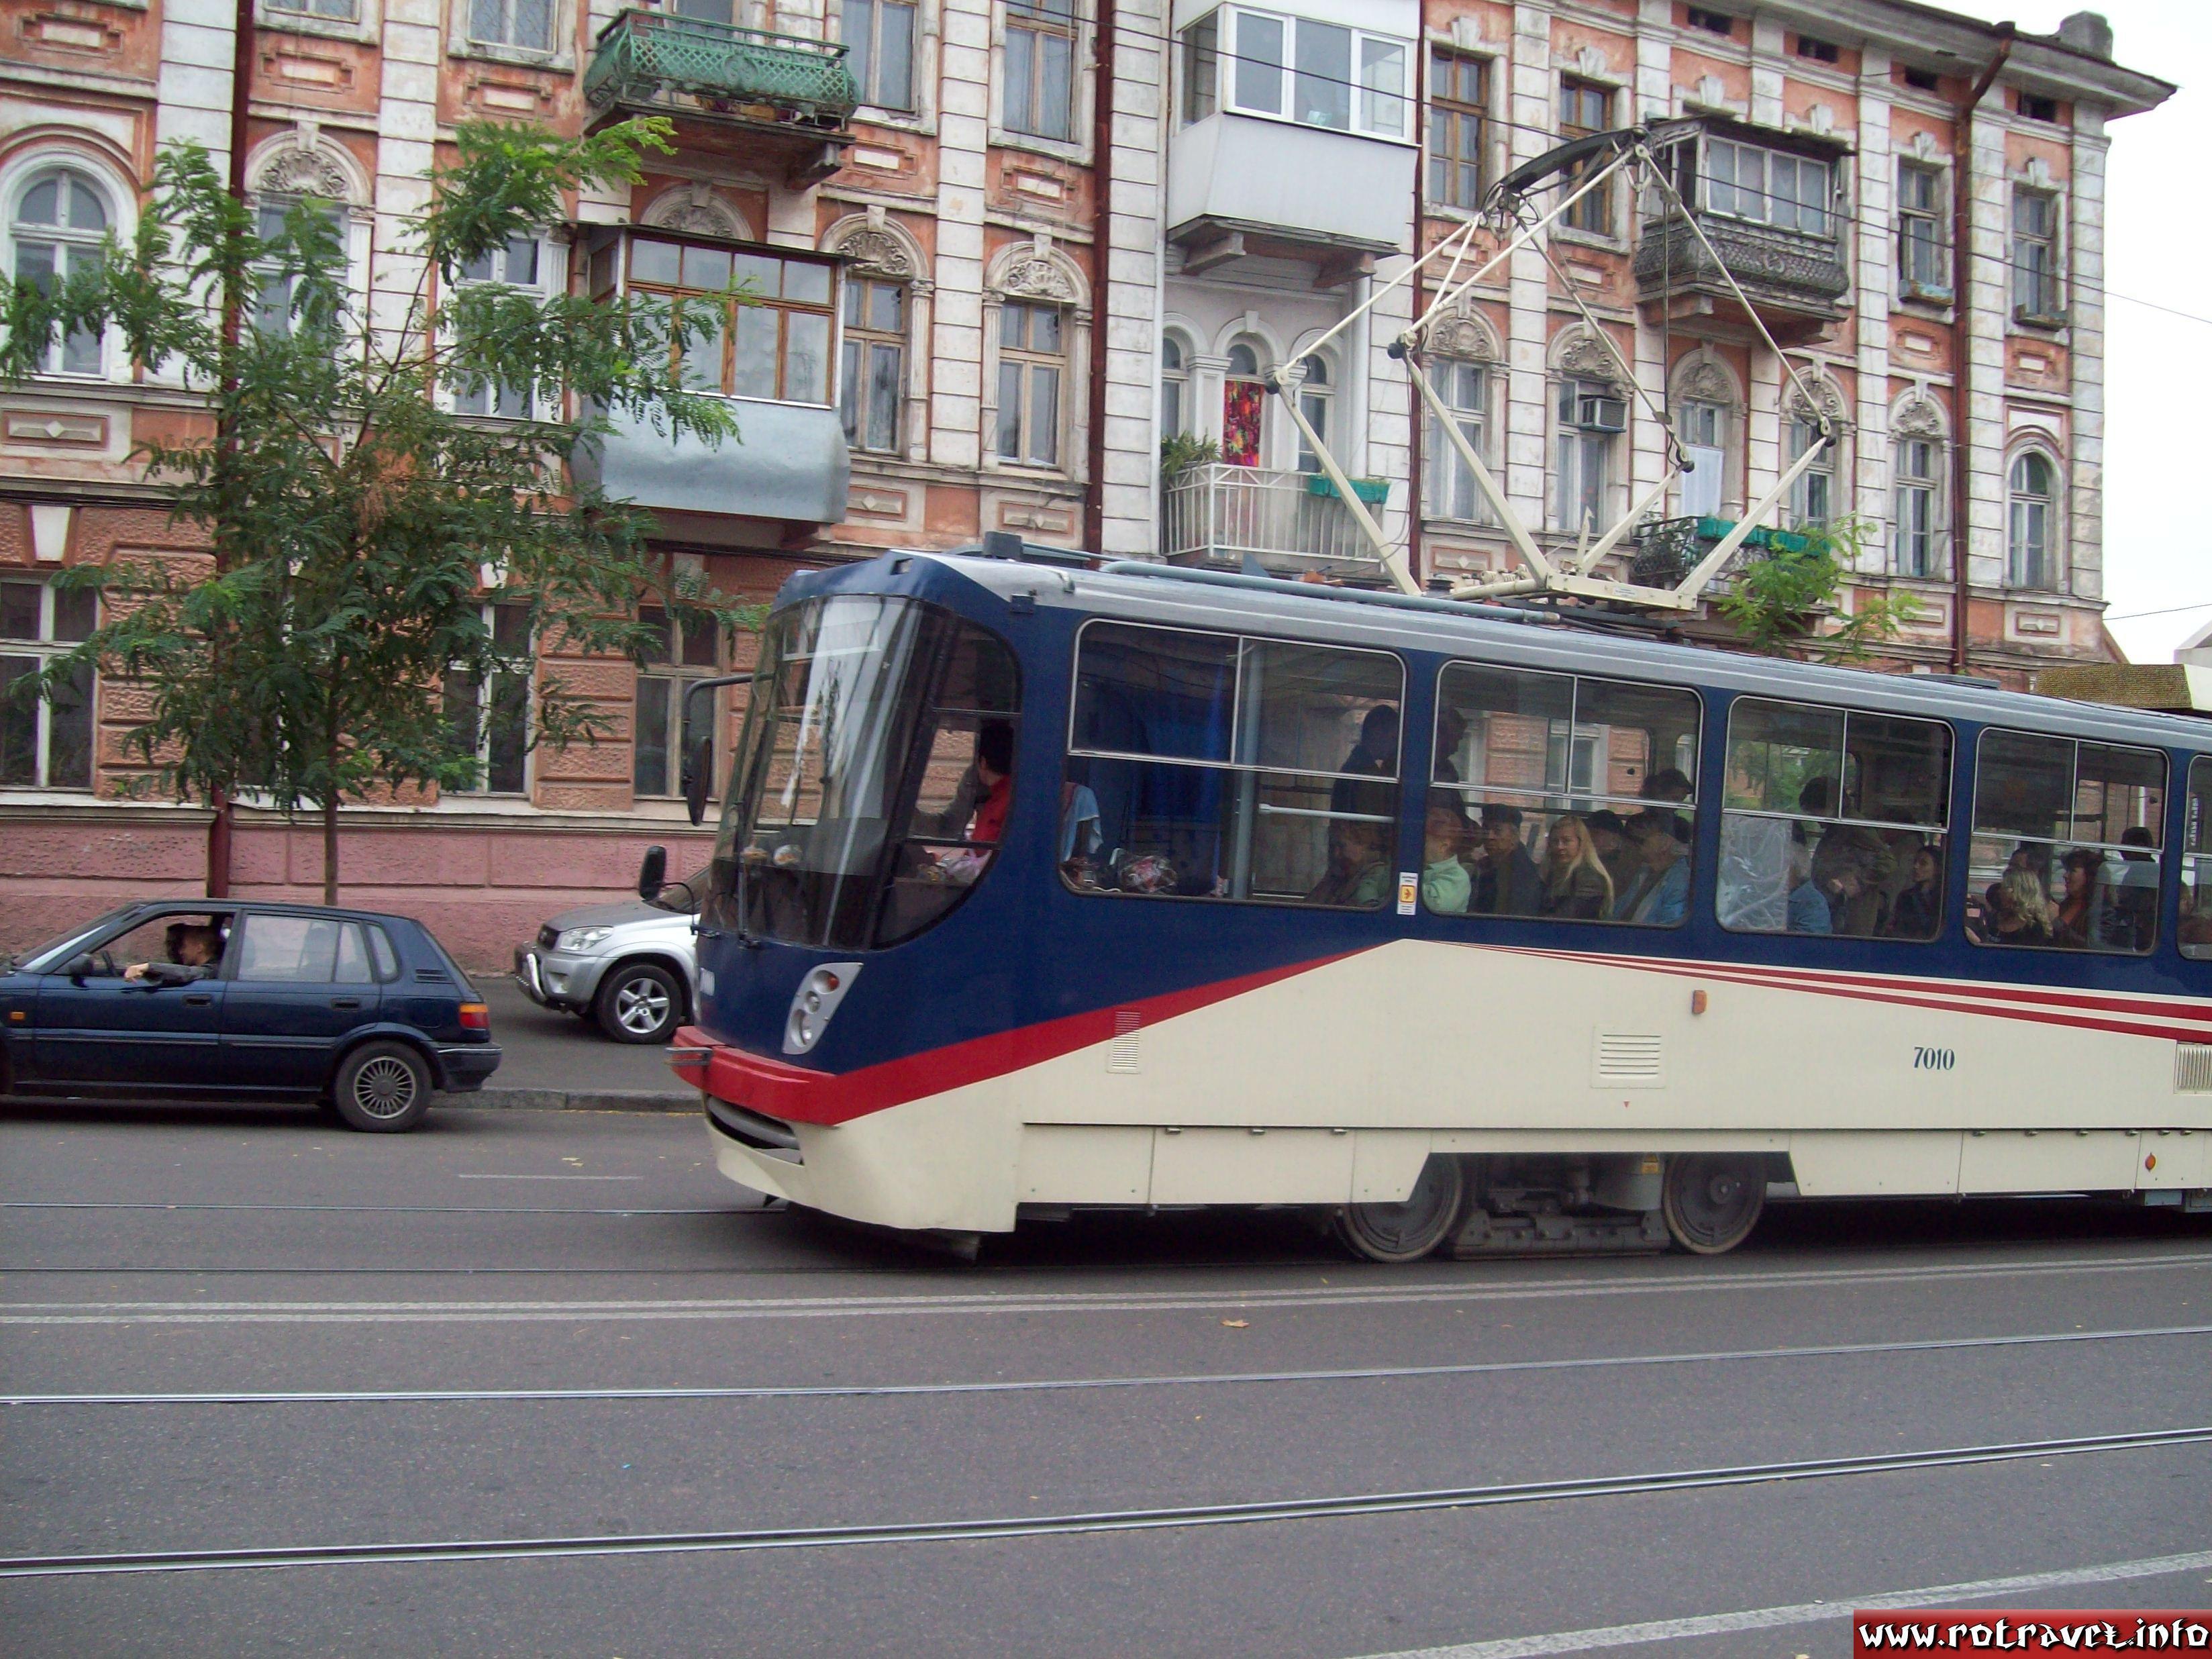 A very width tram